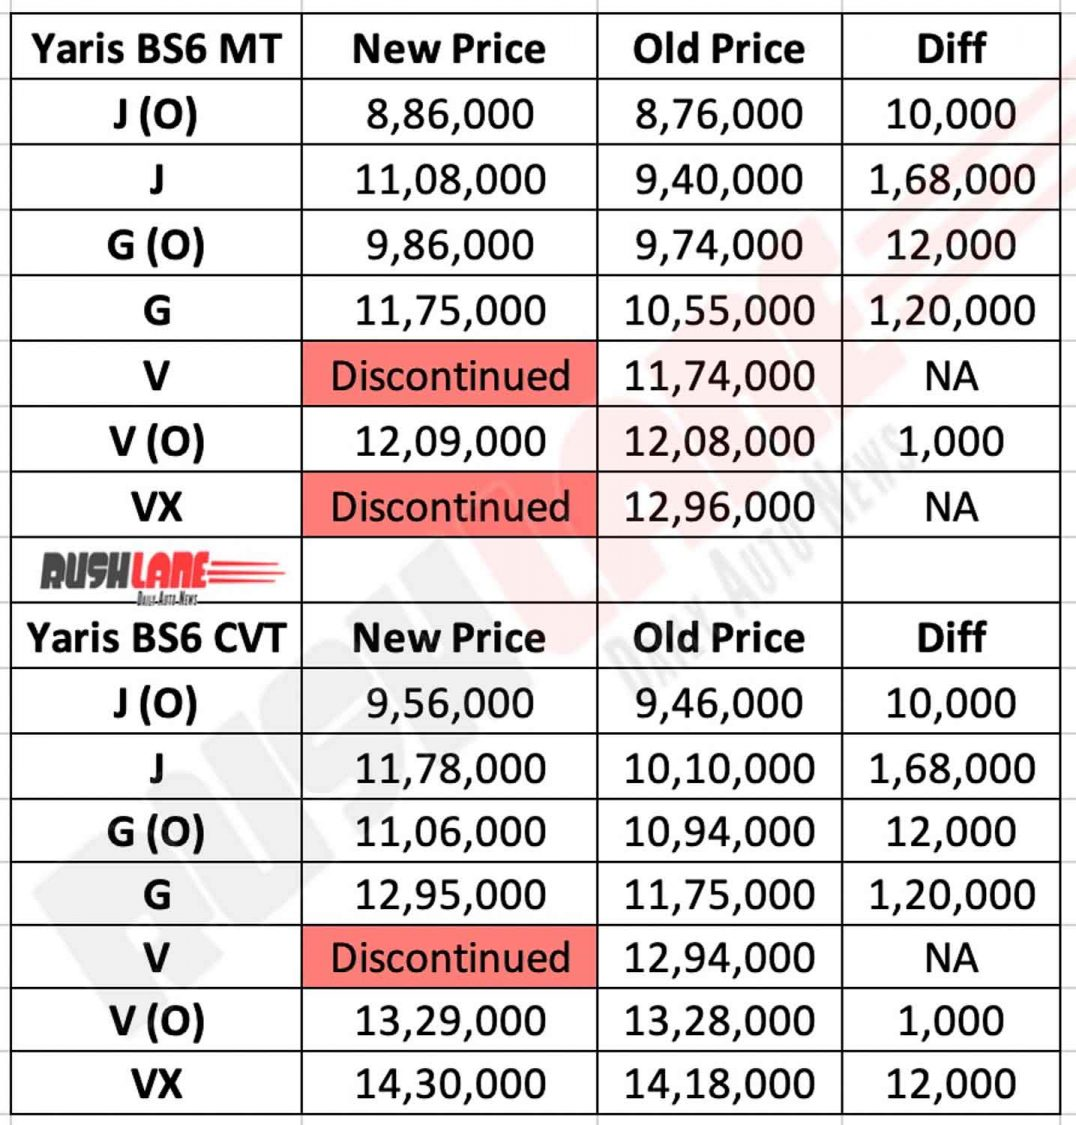 BS6 Toyota Yaris price list